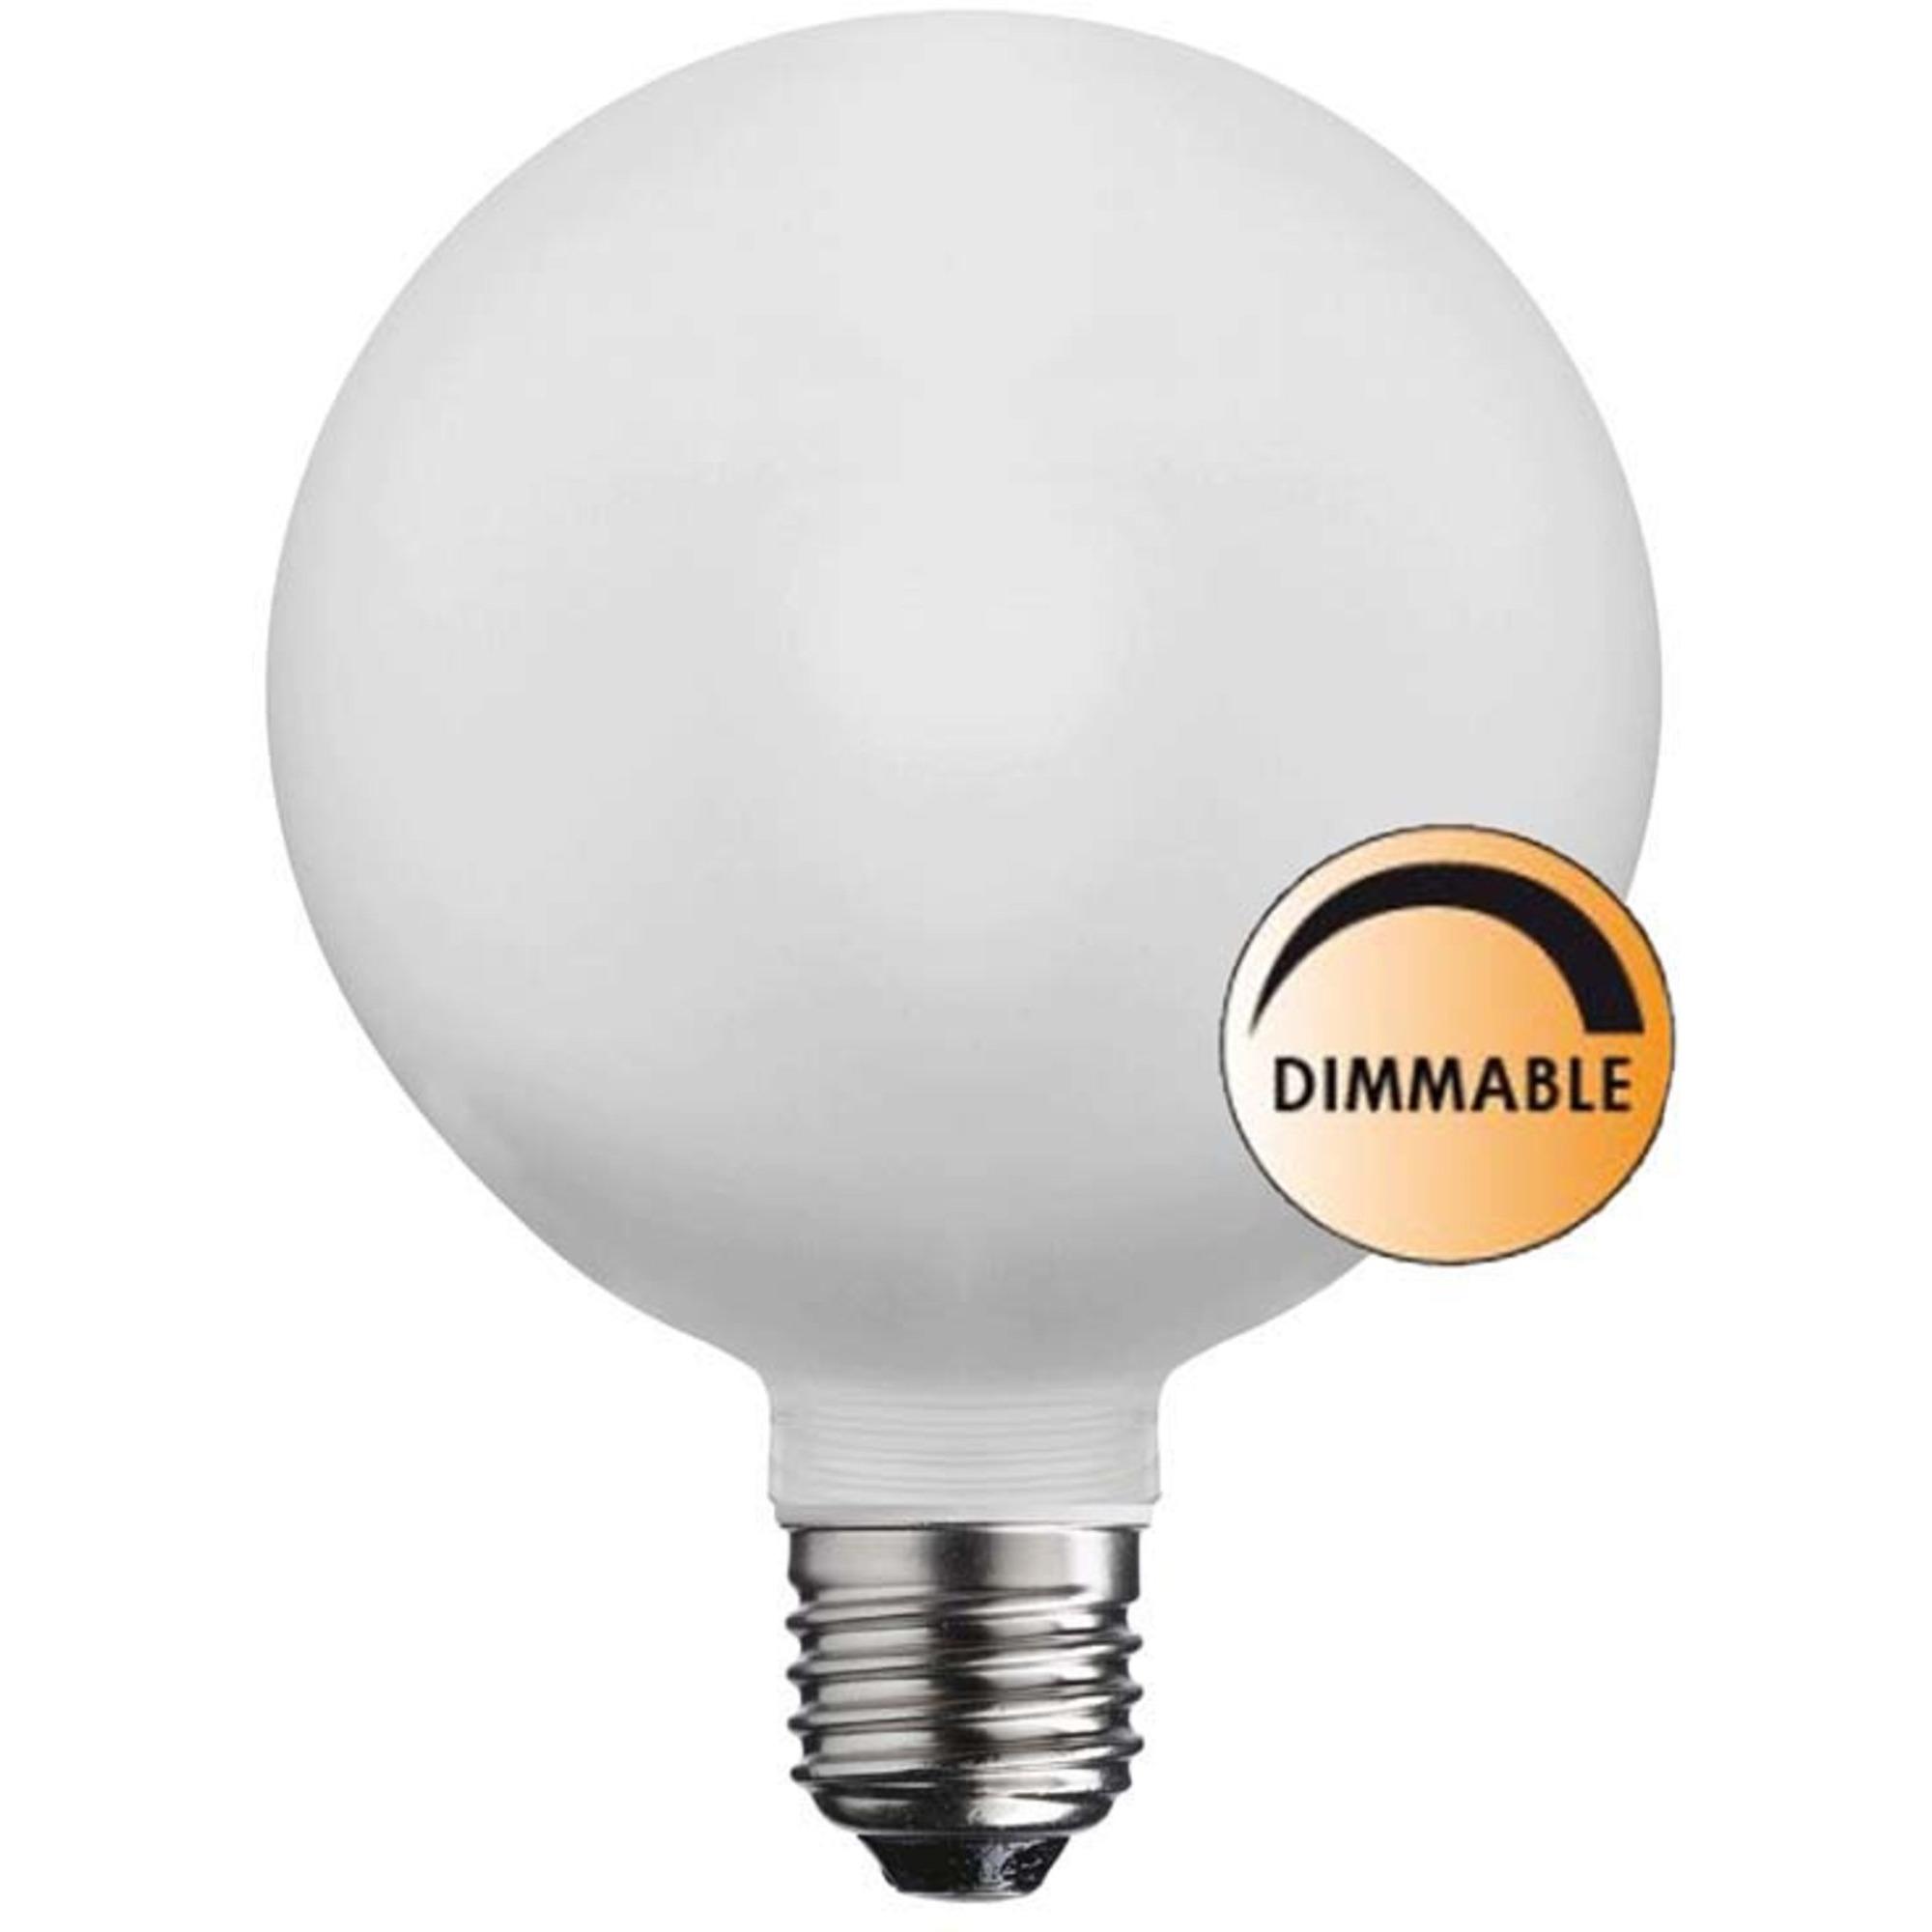 Globen Lighting Ljuskälla Halolux Opal Exkl. Ljusk